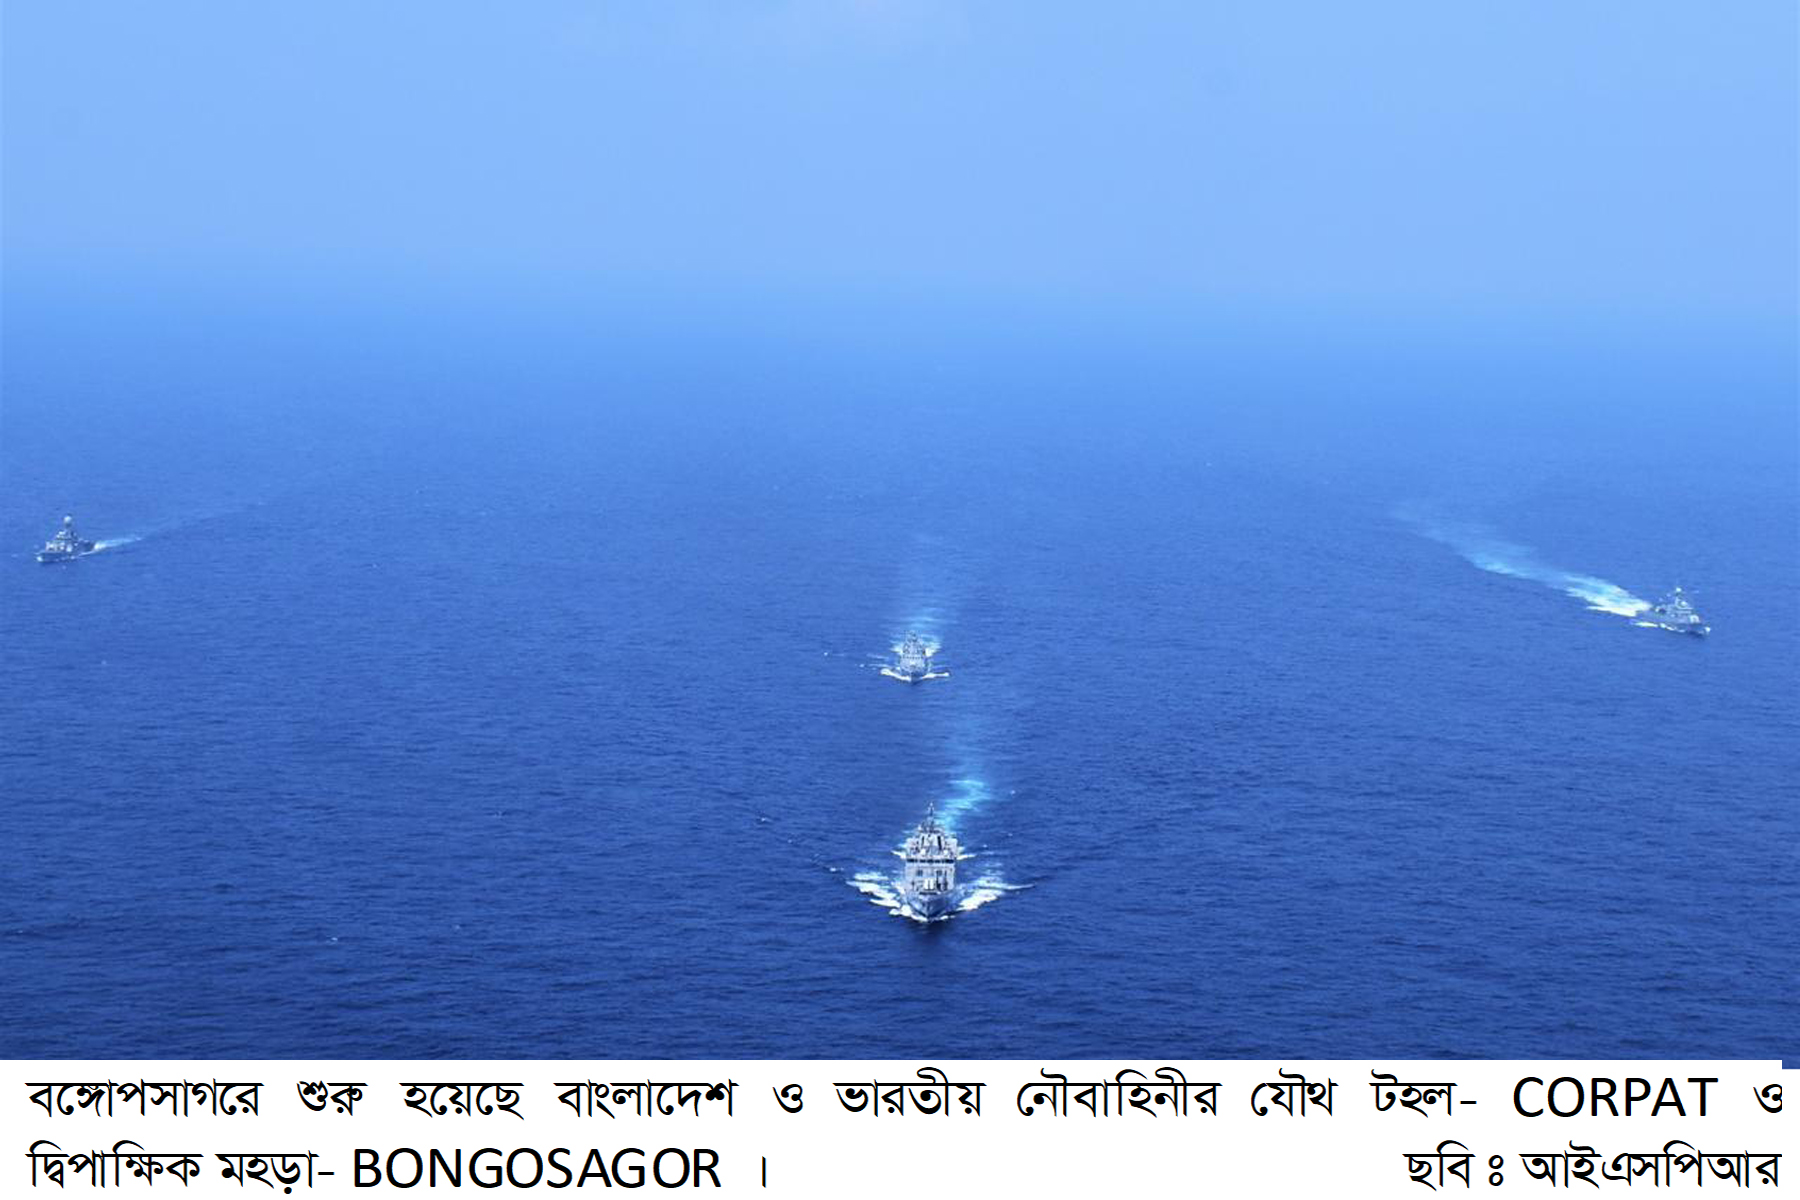 ISPR Navy - 03-10-2020 (1)